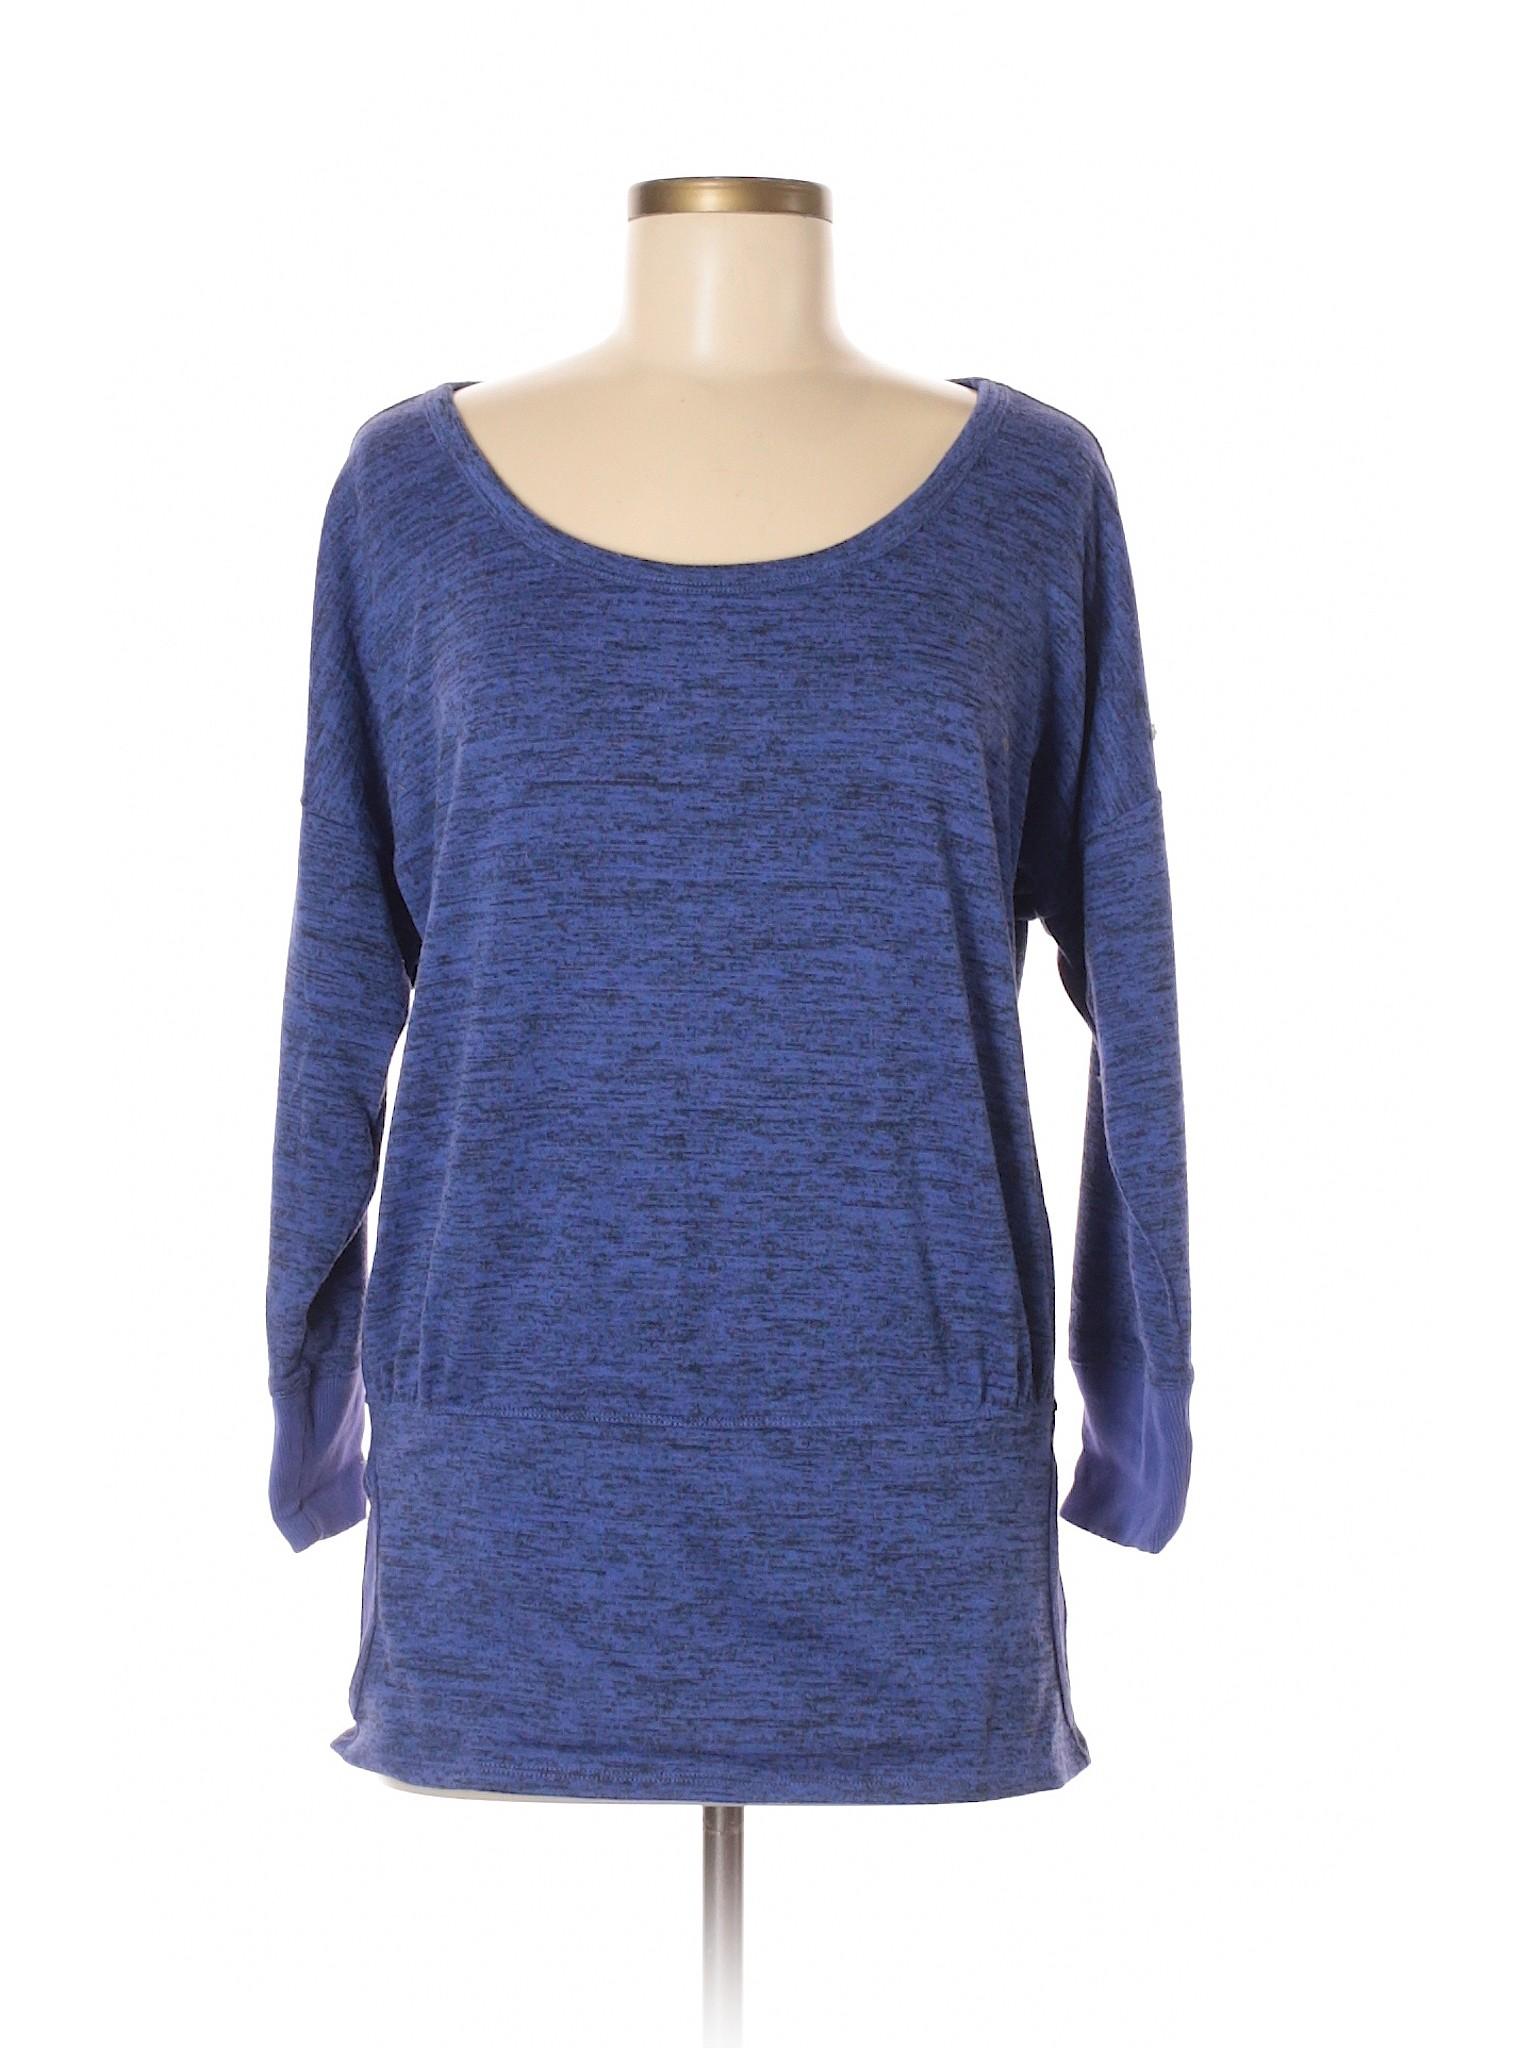 Pullover Sweater winter Athleta Boutique winter Boutique 7nvqX0I